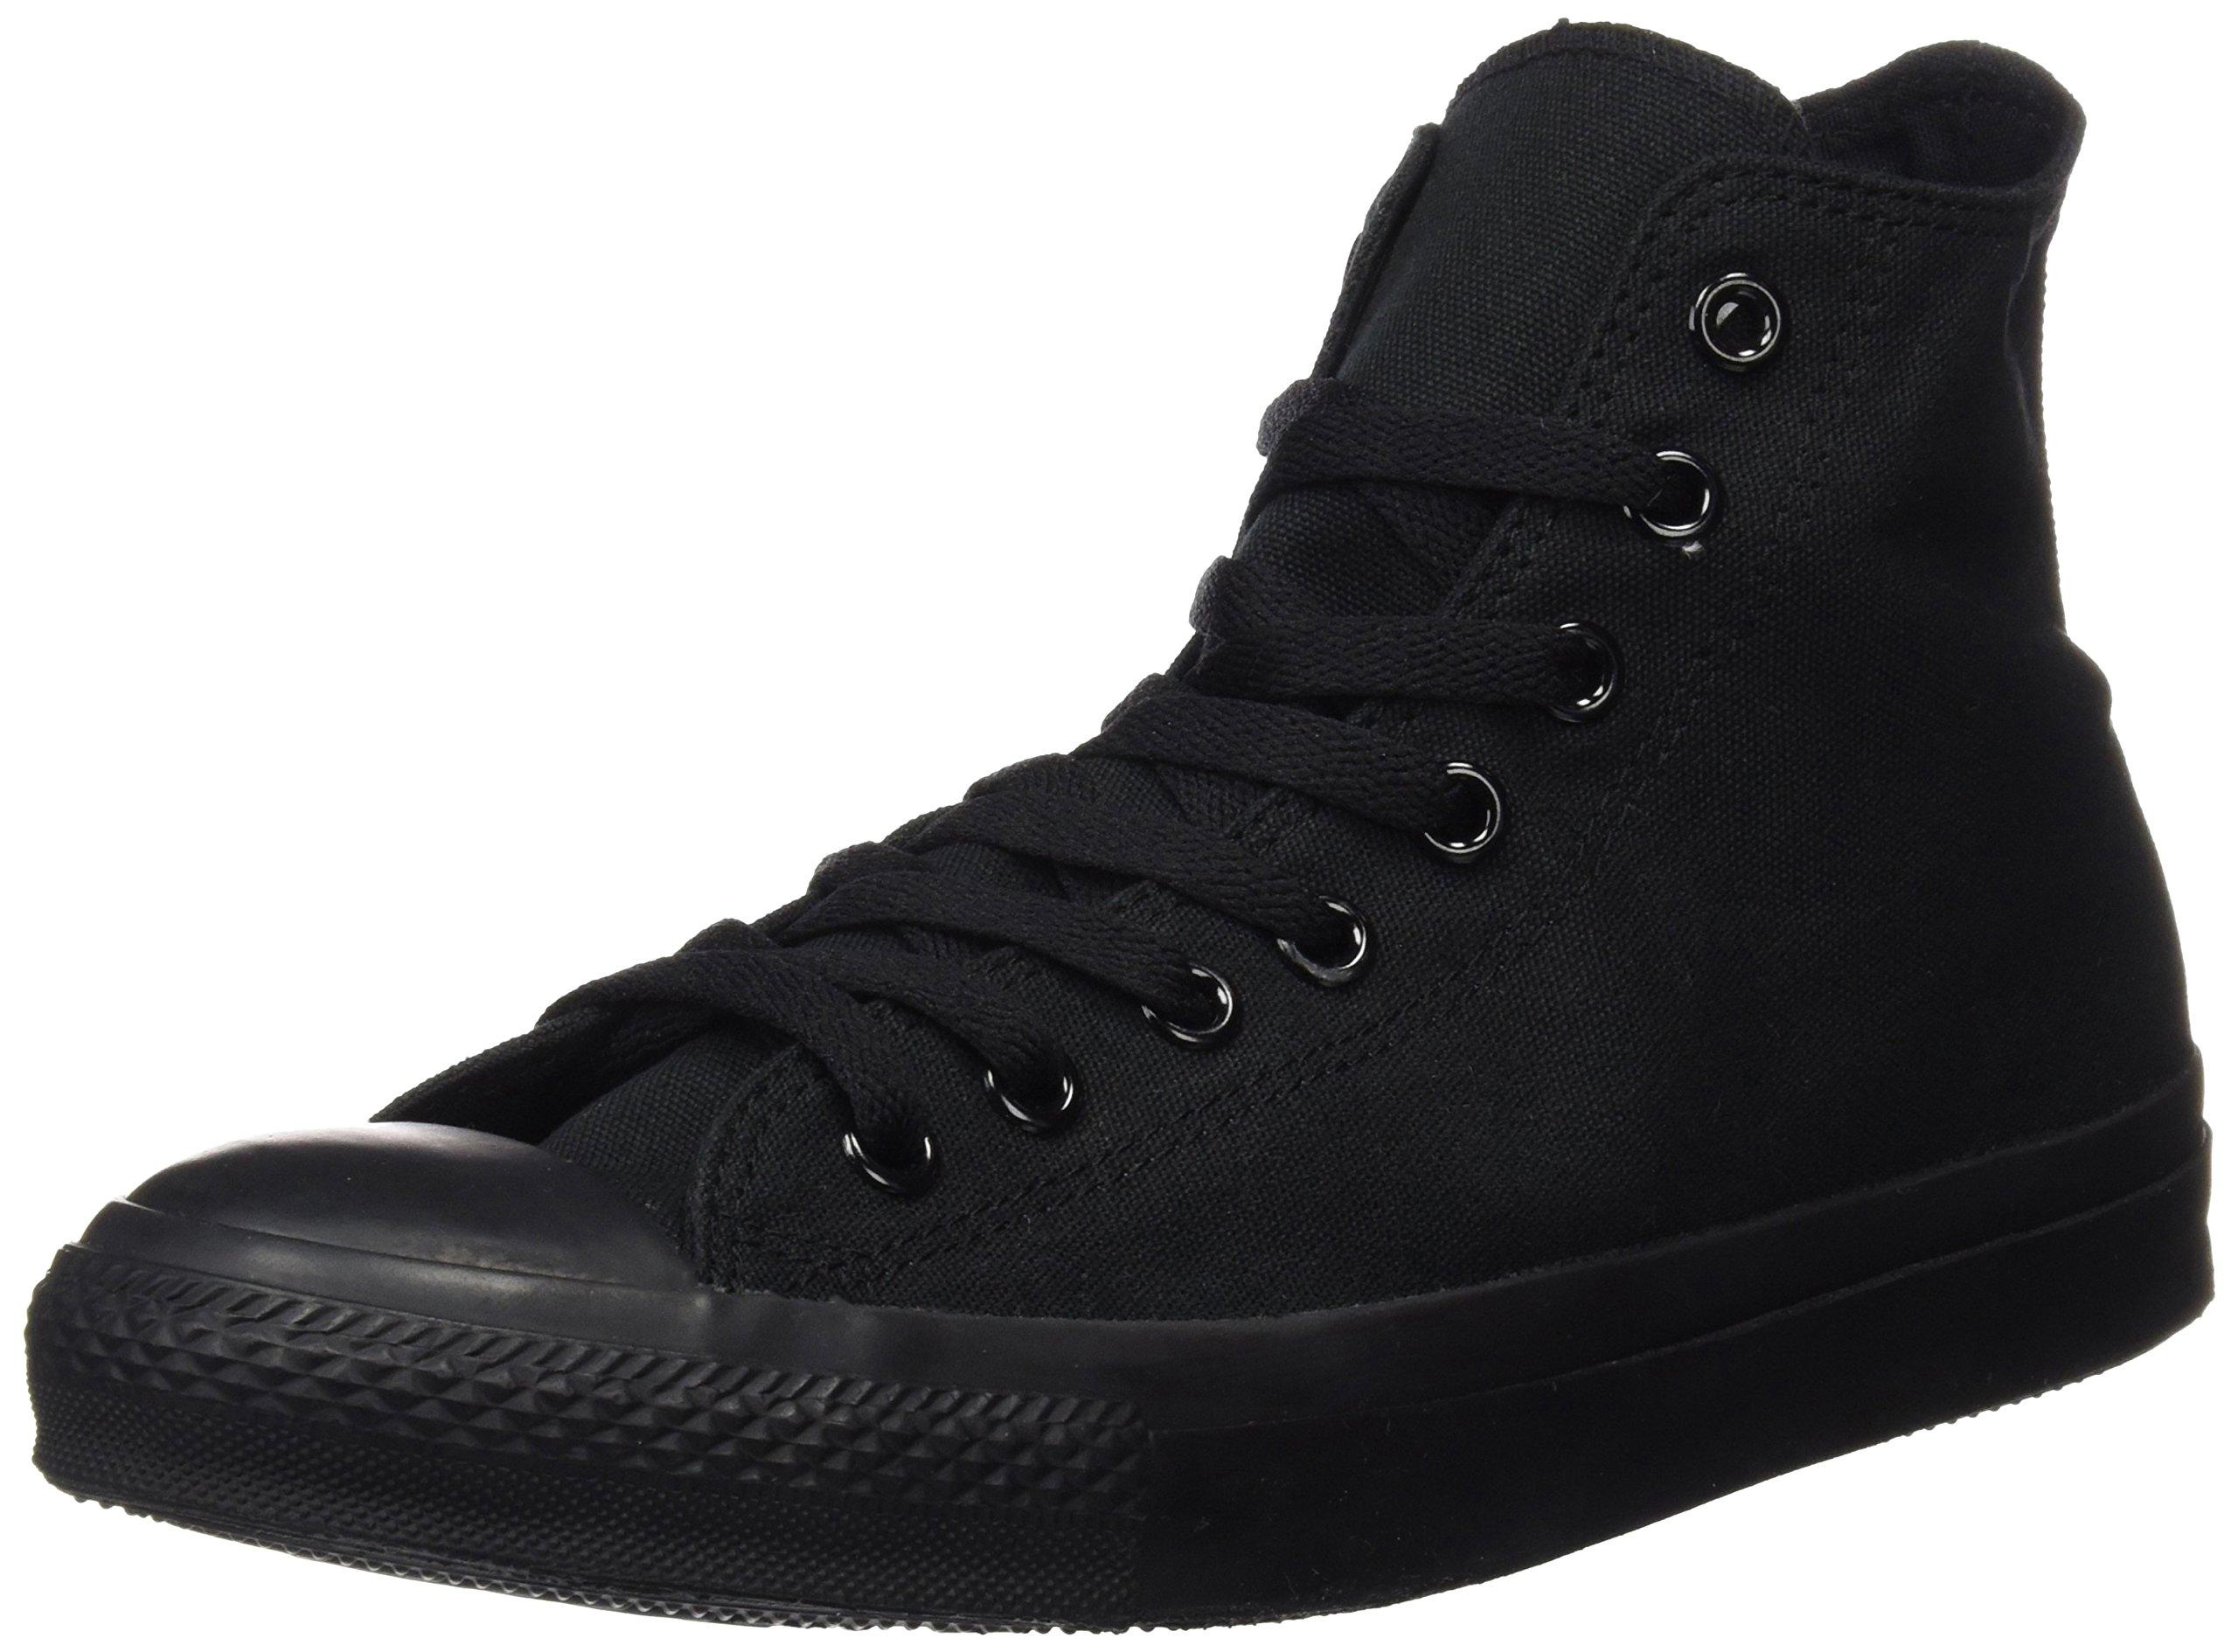 Converse Chuck Taylor All Star Canvas High Top Sneaker, Black Monochrome, 15 US Men/17 US Women